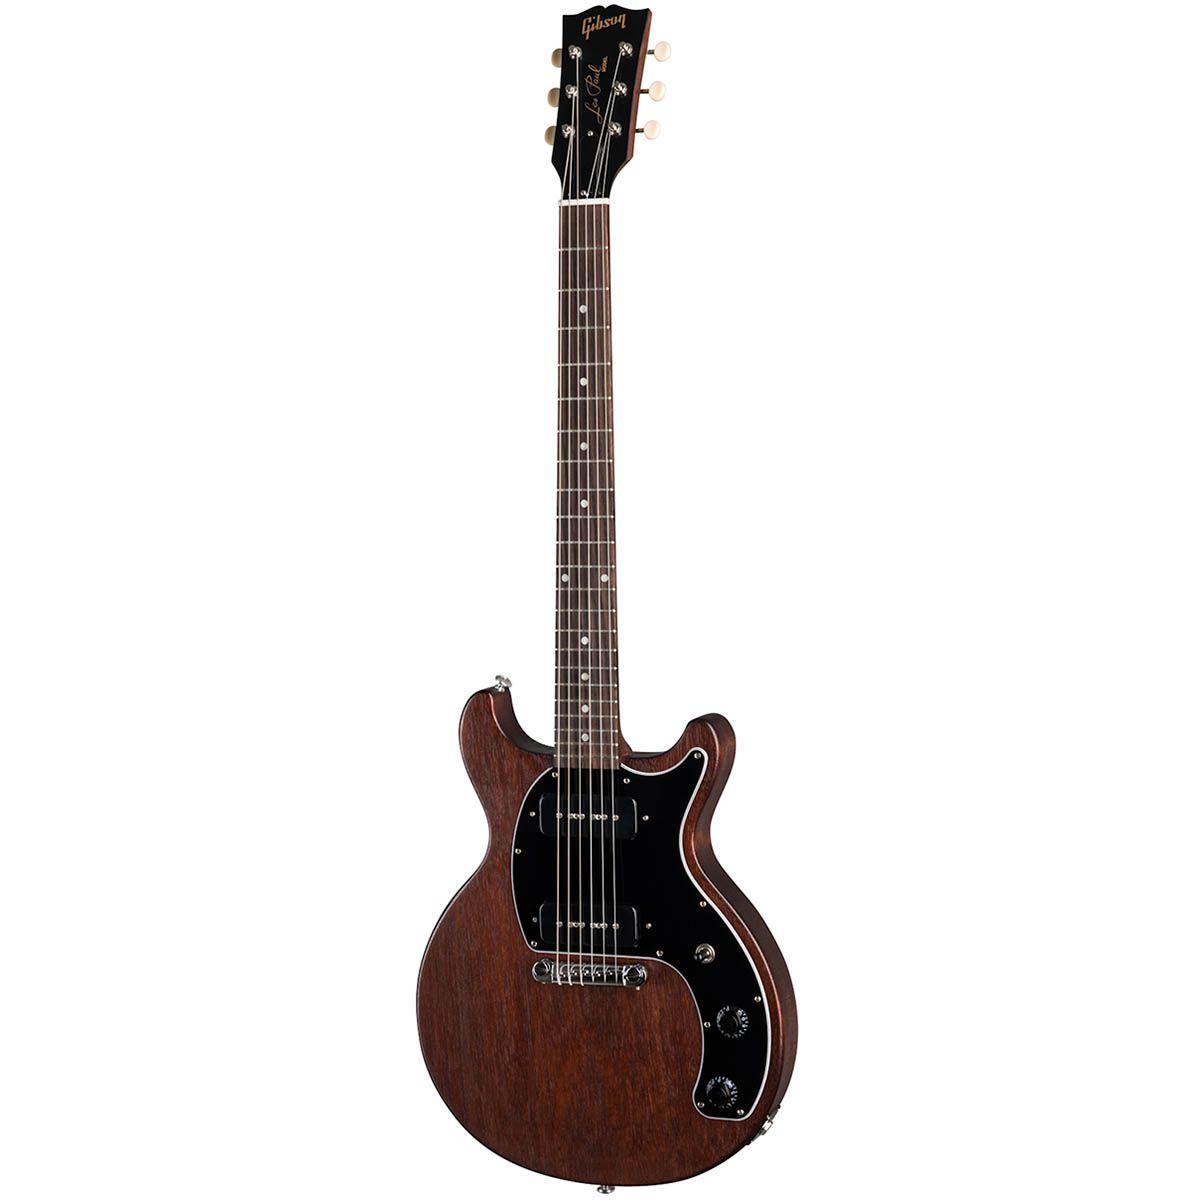 Guitarra Gibson Les Paul Special Tribute DC Worn Brown